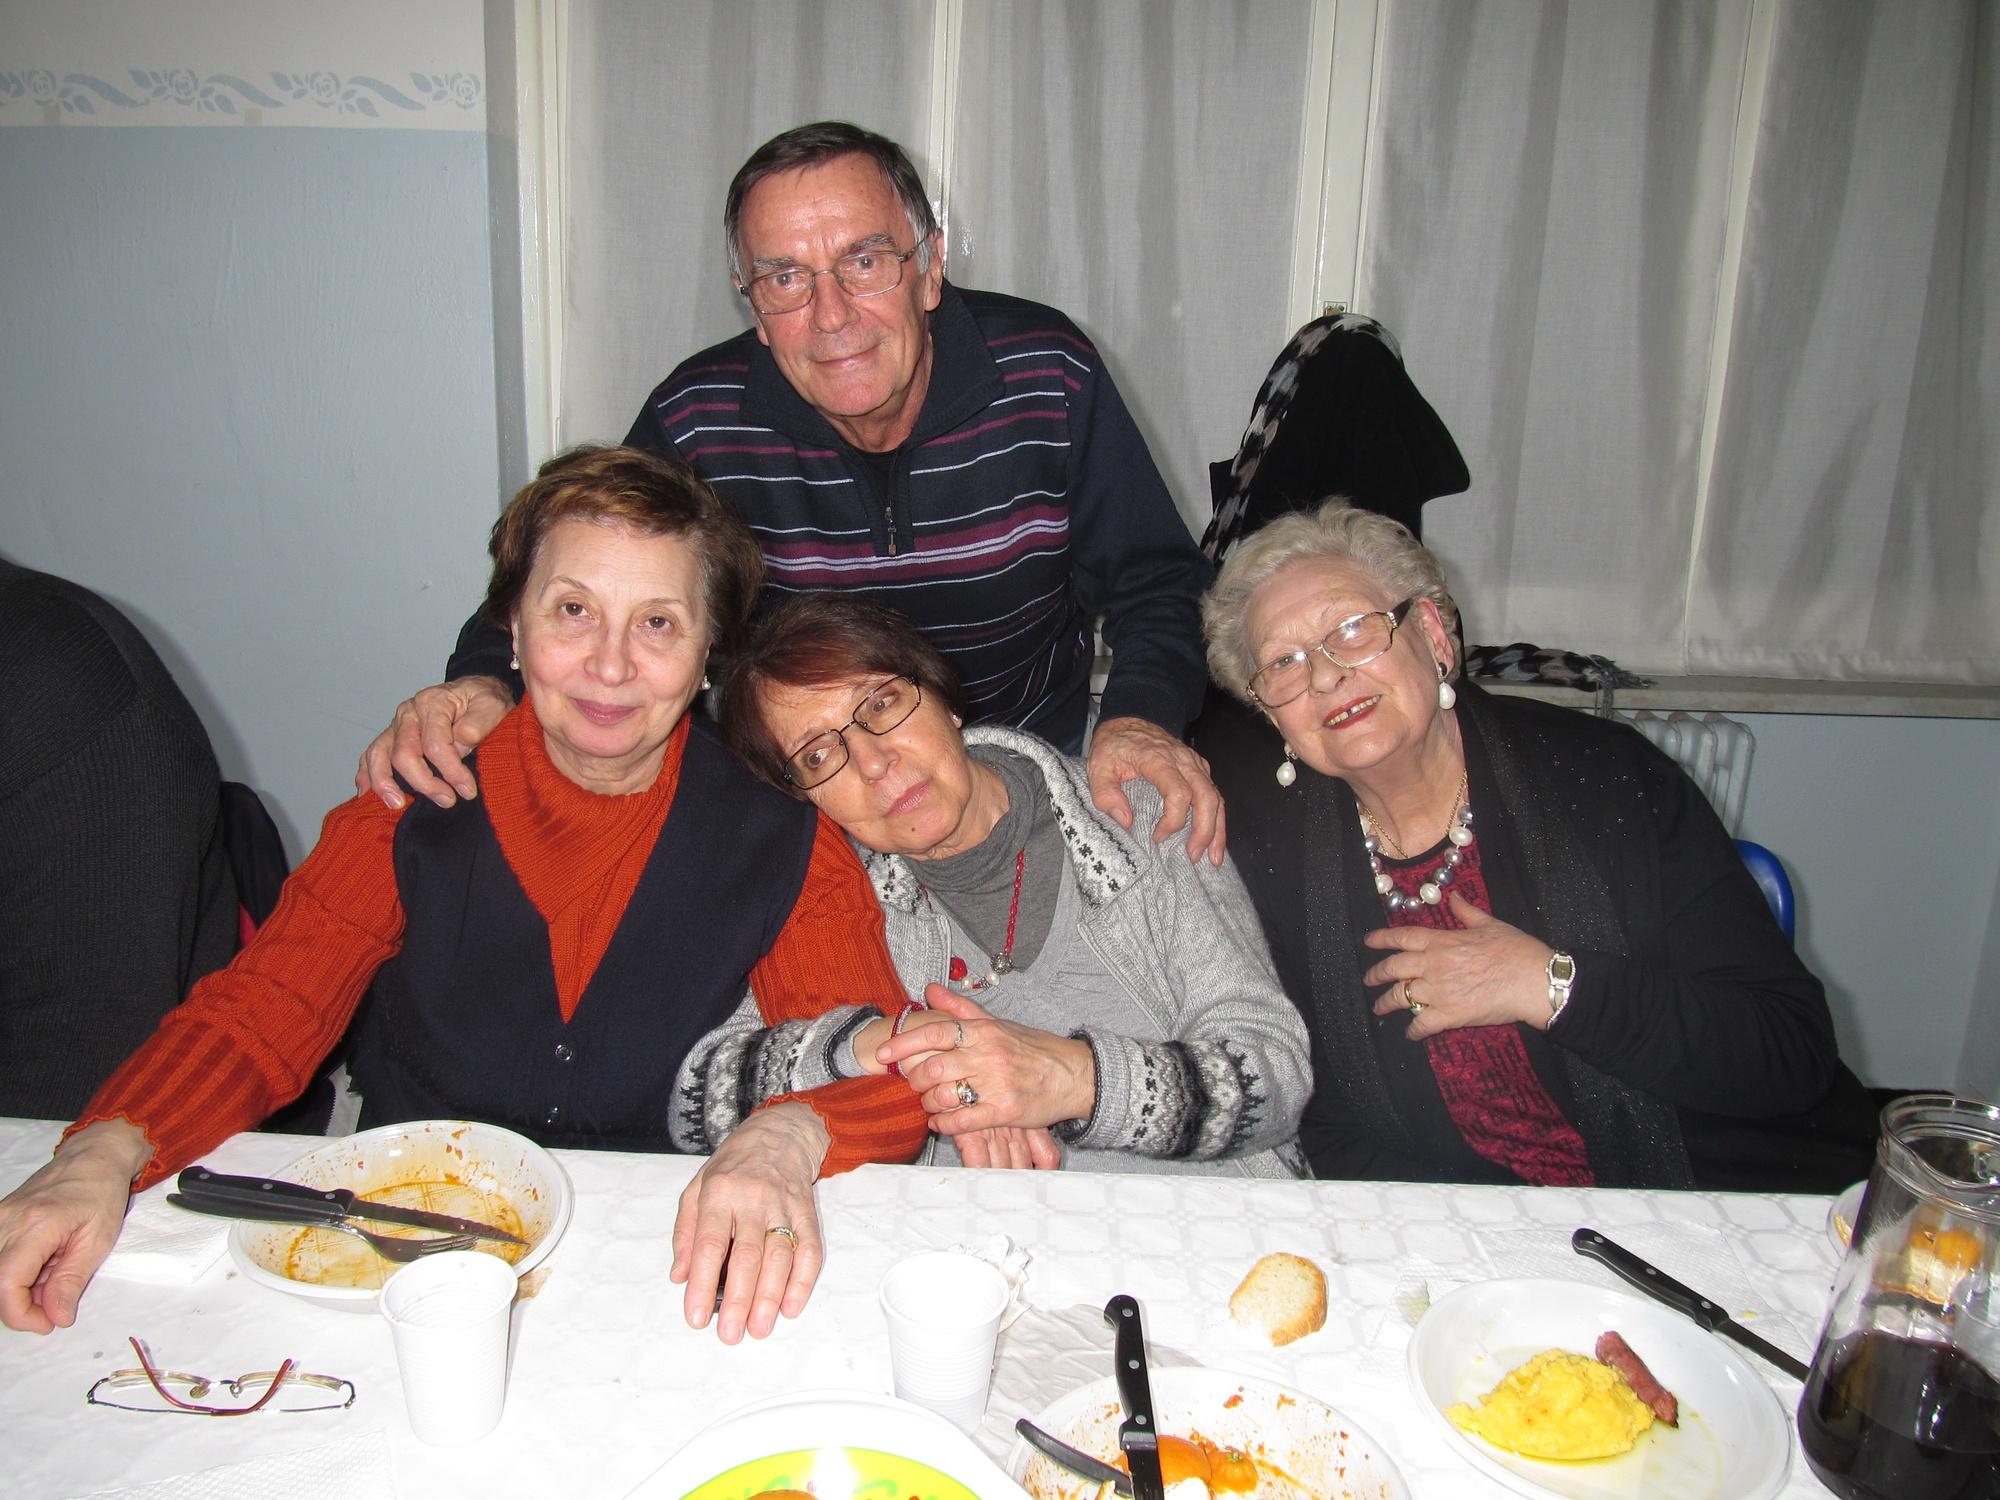 polentata-2016-02-20-21-01-44